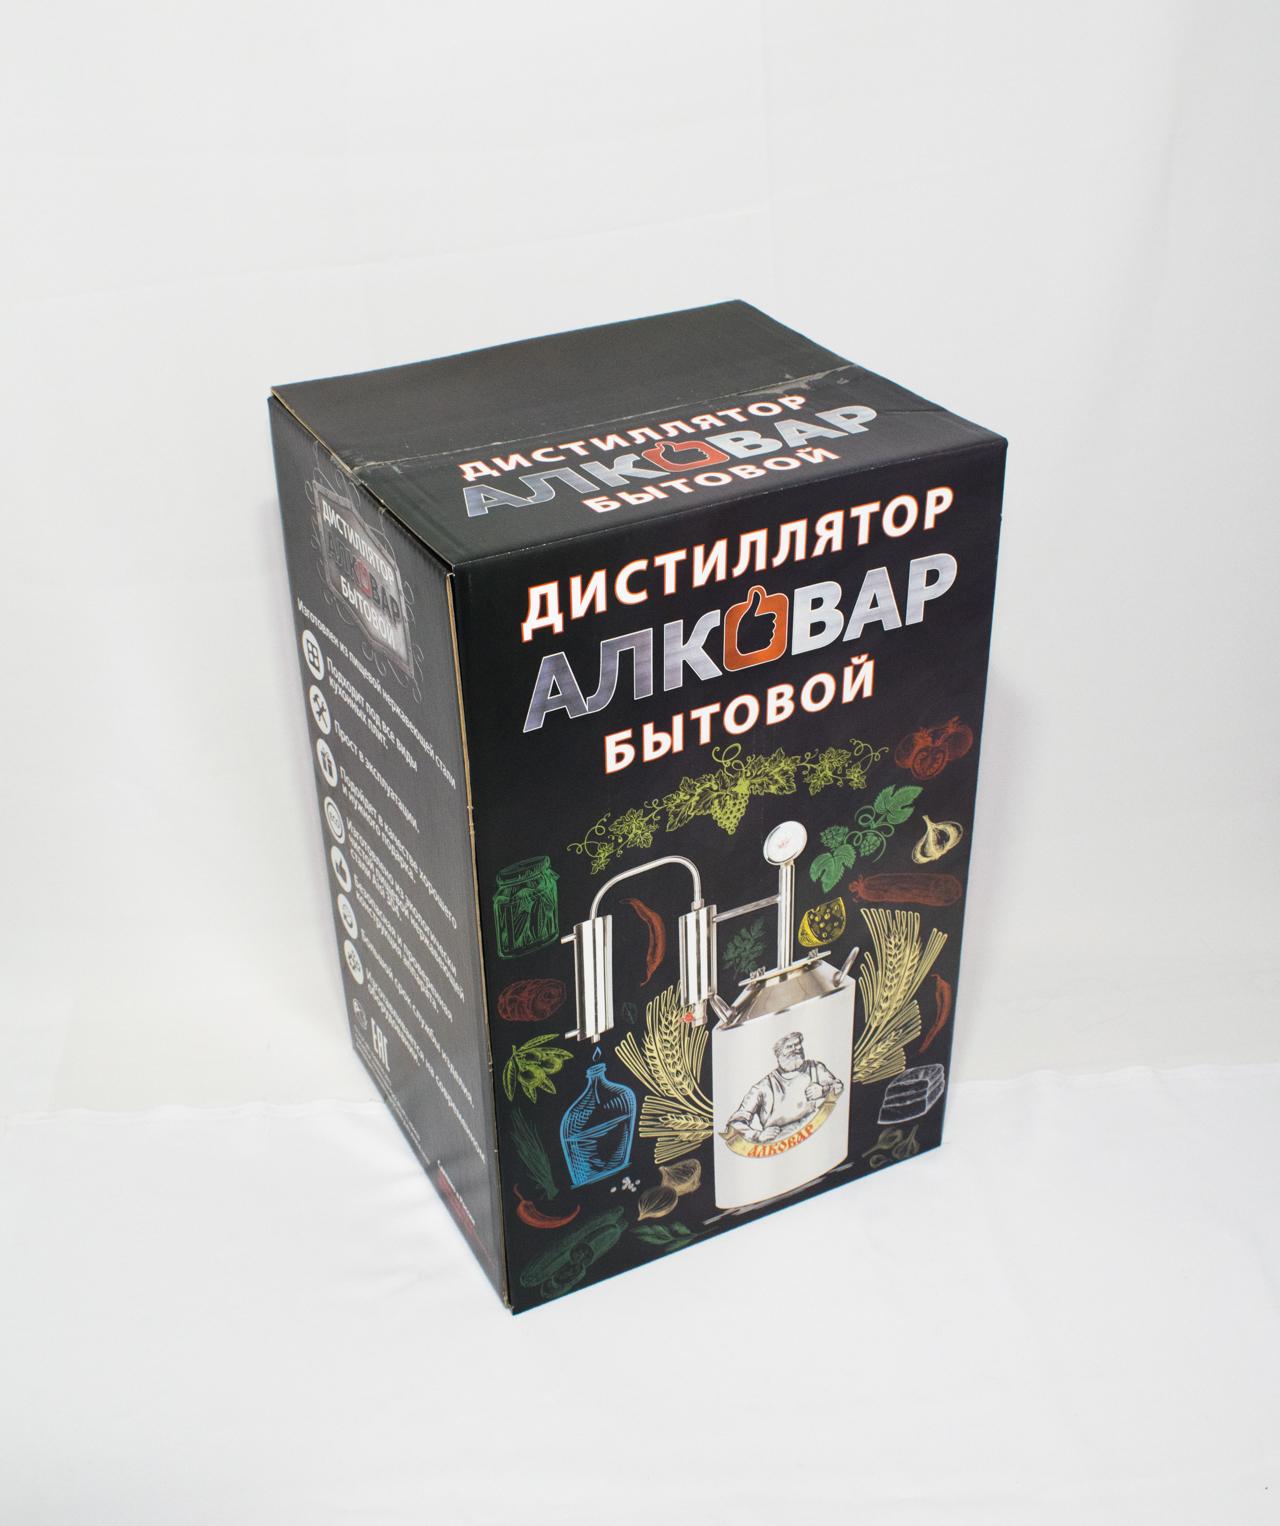 Упаковка самогонных аппаратов АЛКОВАР